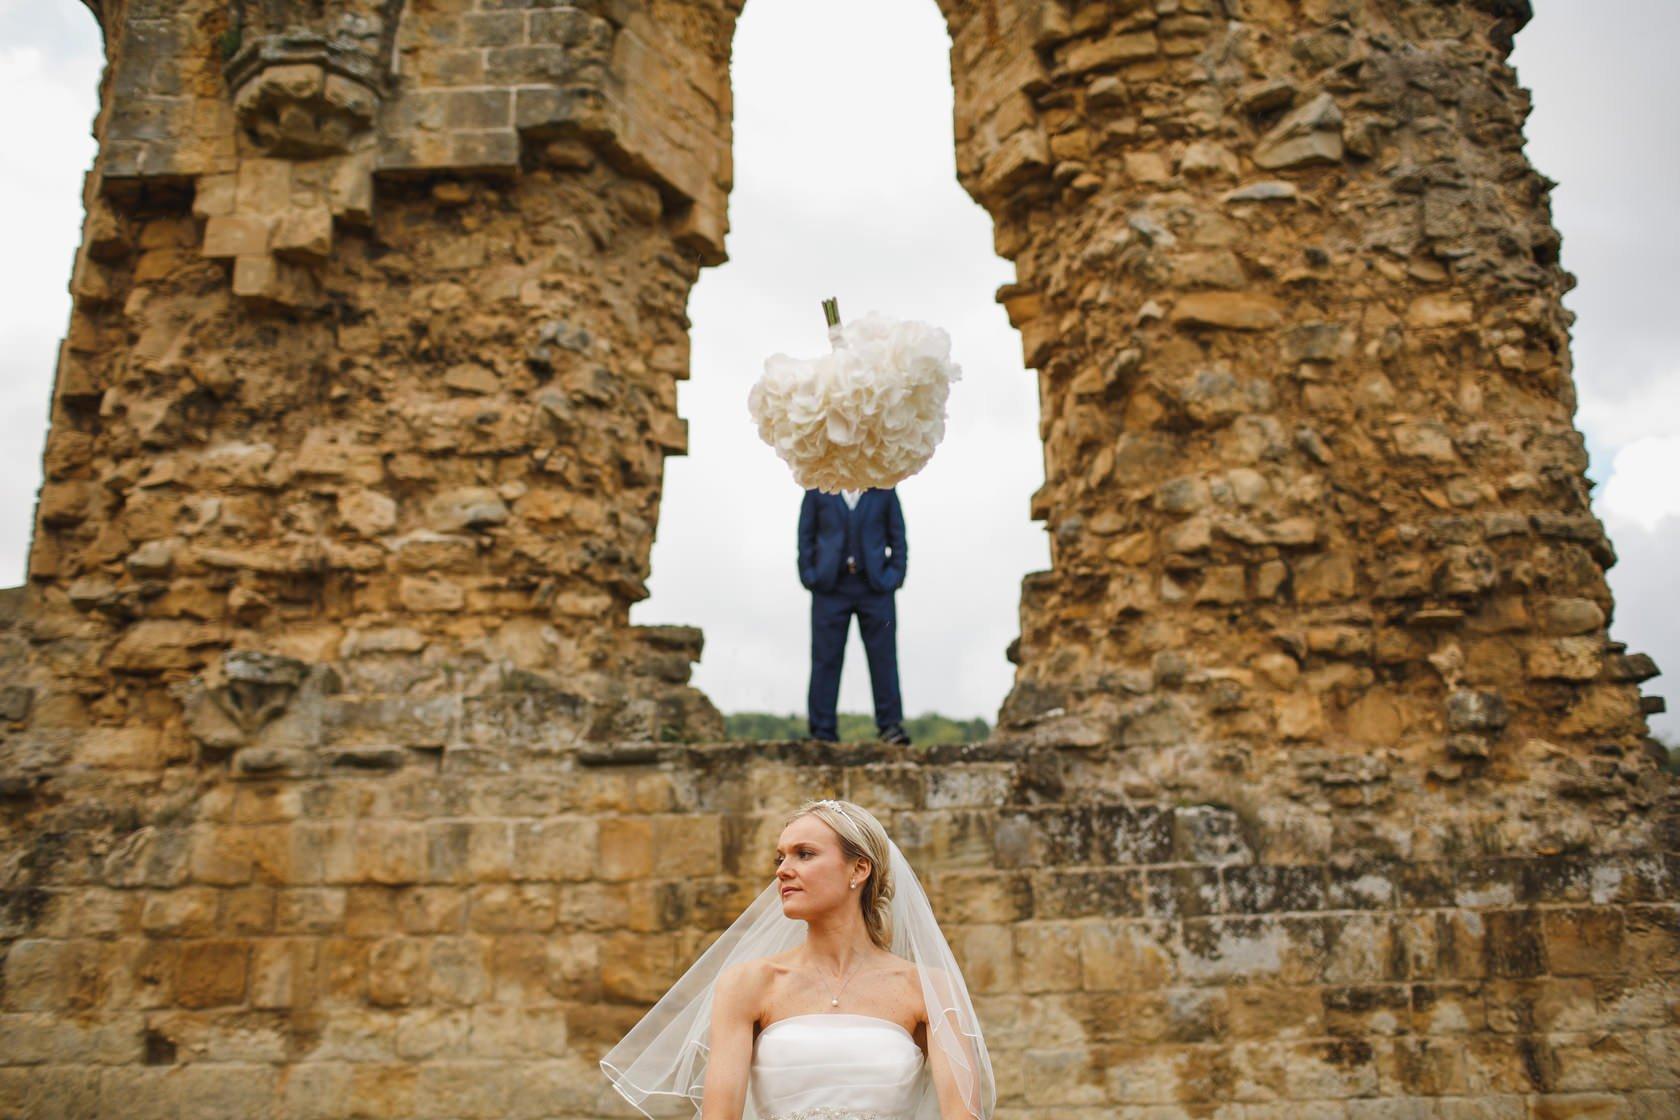 Byland abbey wedding photography 53